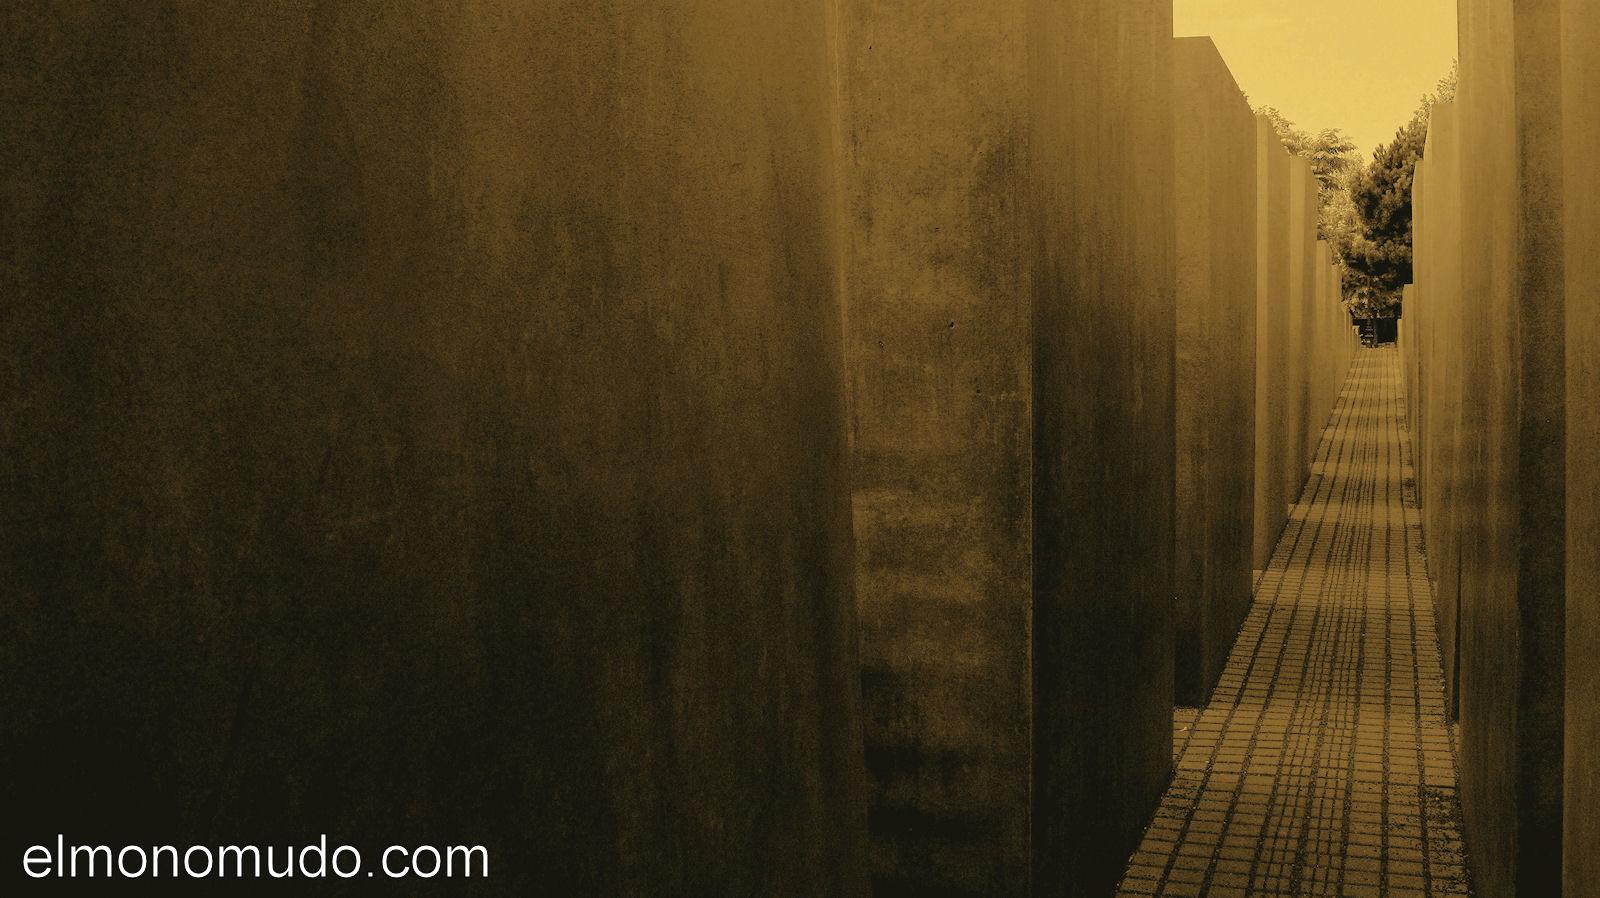 monumento-al-holocausto-berlin-2010-interior